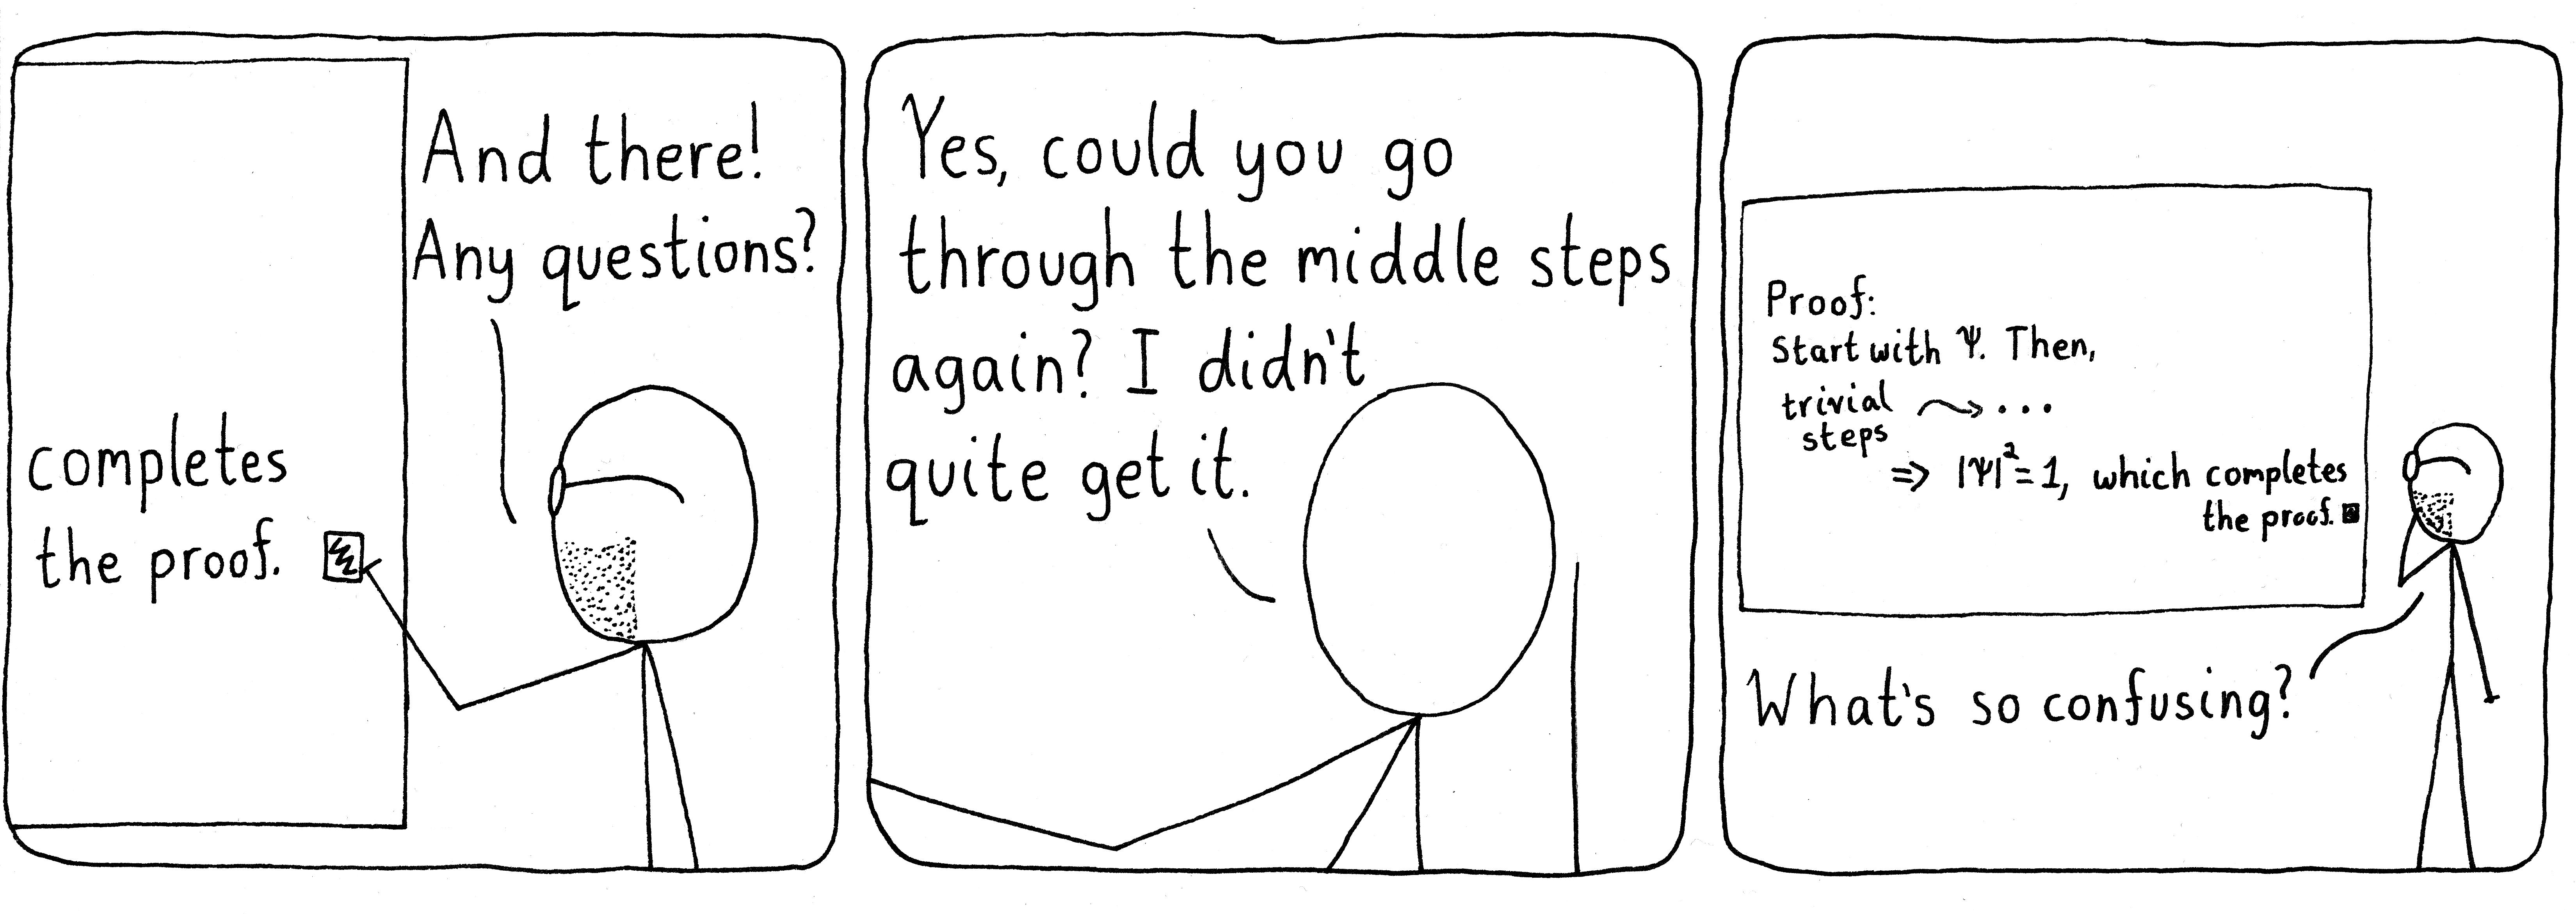 Professors skipping the intermediate steps.